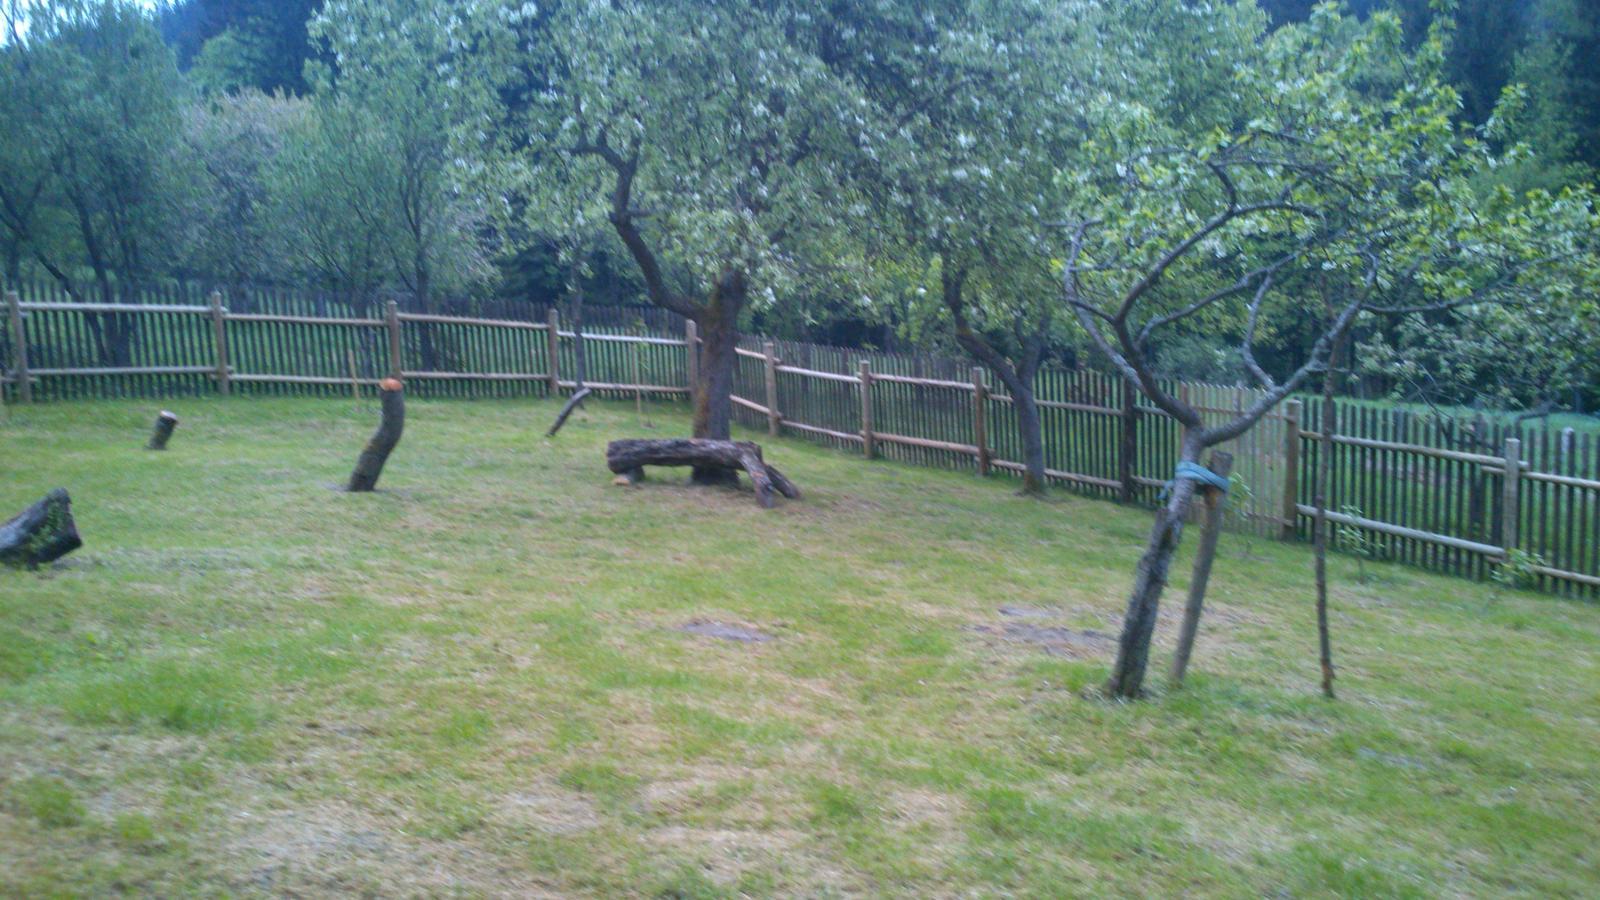 Naša drevenička - po stavbe plotu proti jelenom, srnkam, diviakom, jazvecom,(spaciruju sa tu ako na korze) sme začali davat do poriadku zahradu